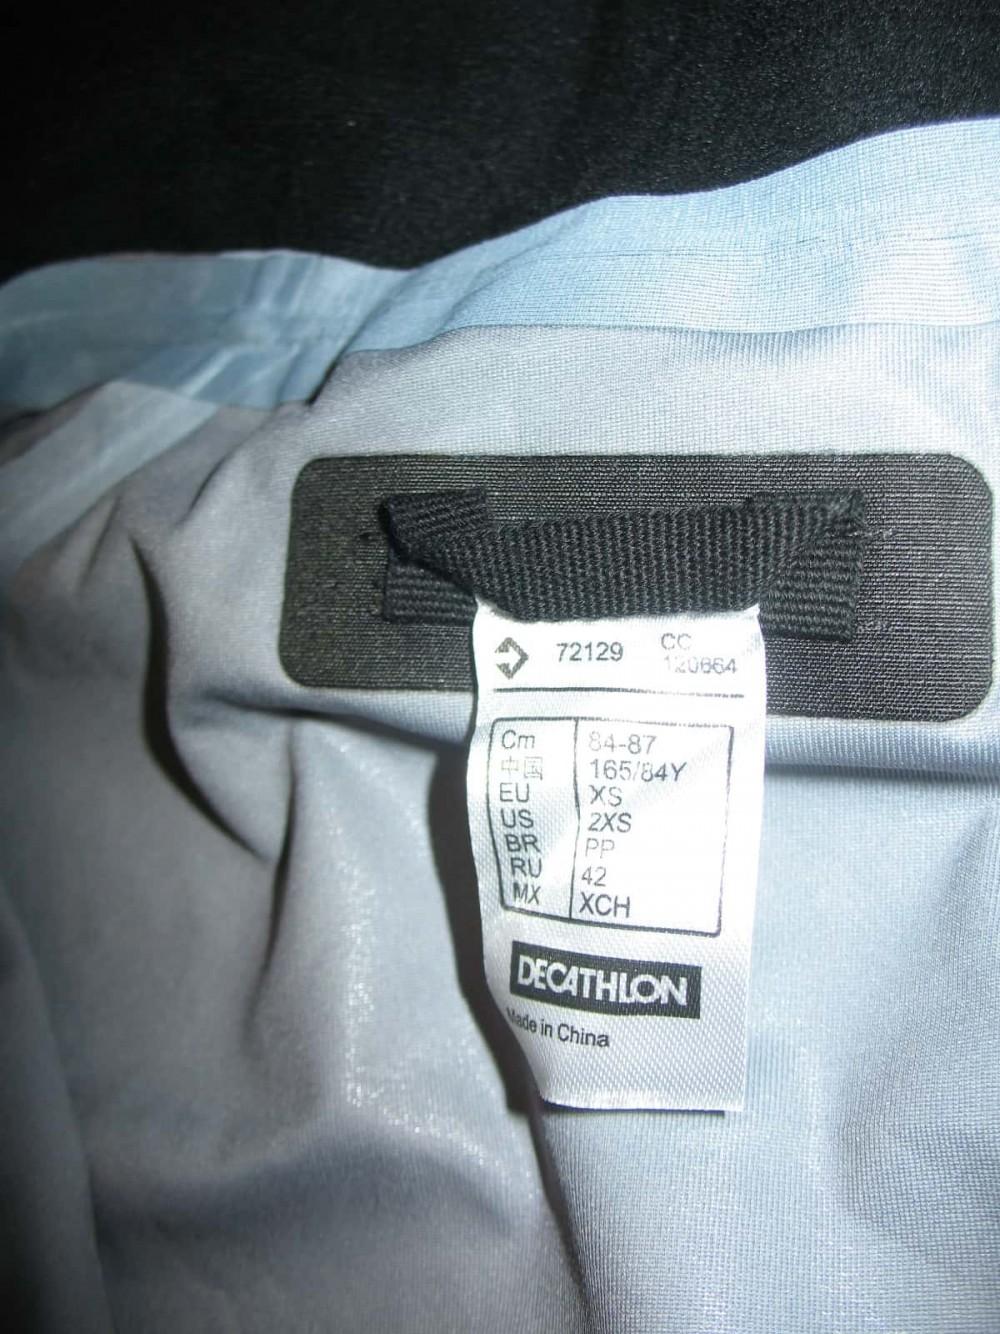 Куртка QUECHUA forclaz 900 l jacket lady (размер XS/S) - 12